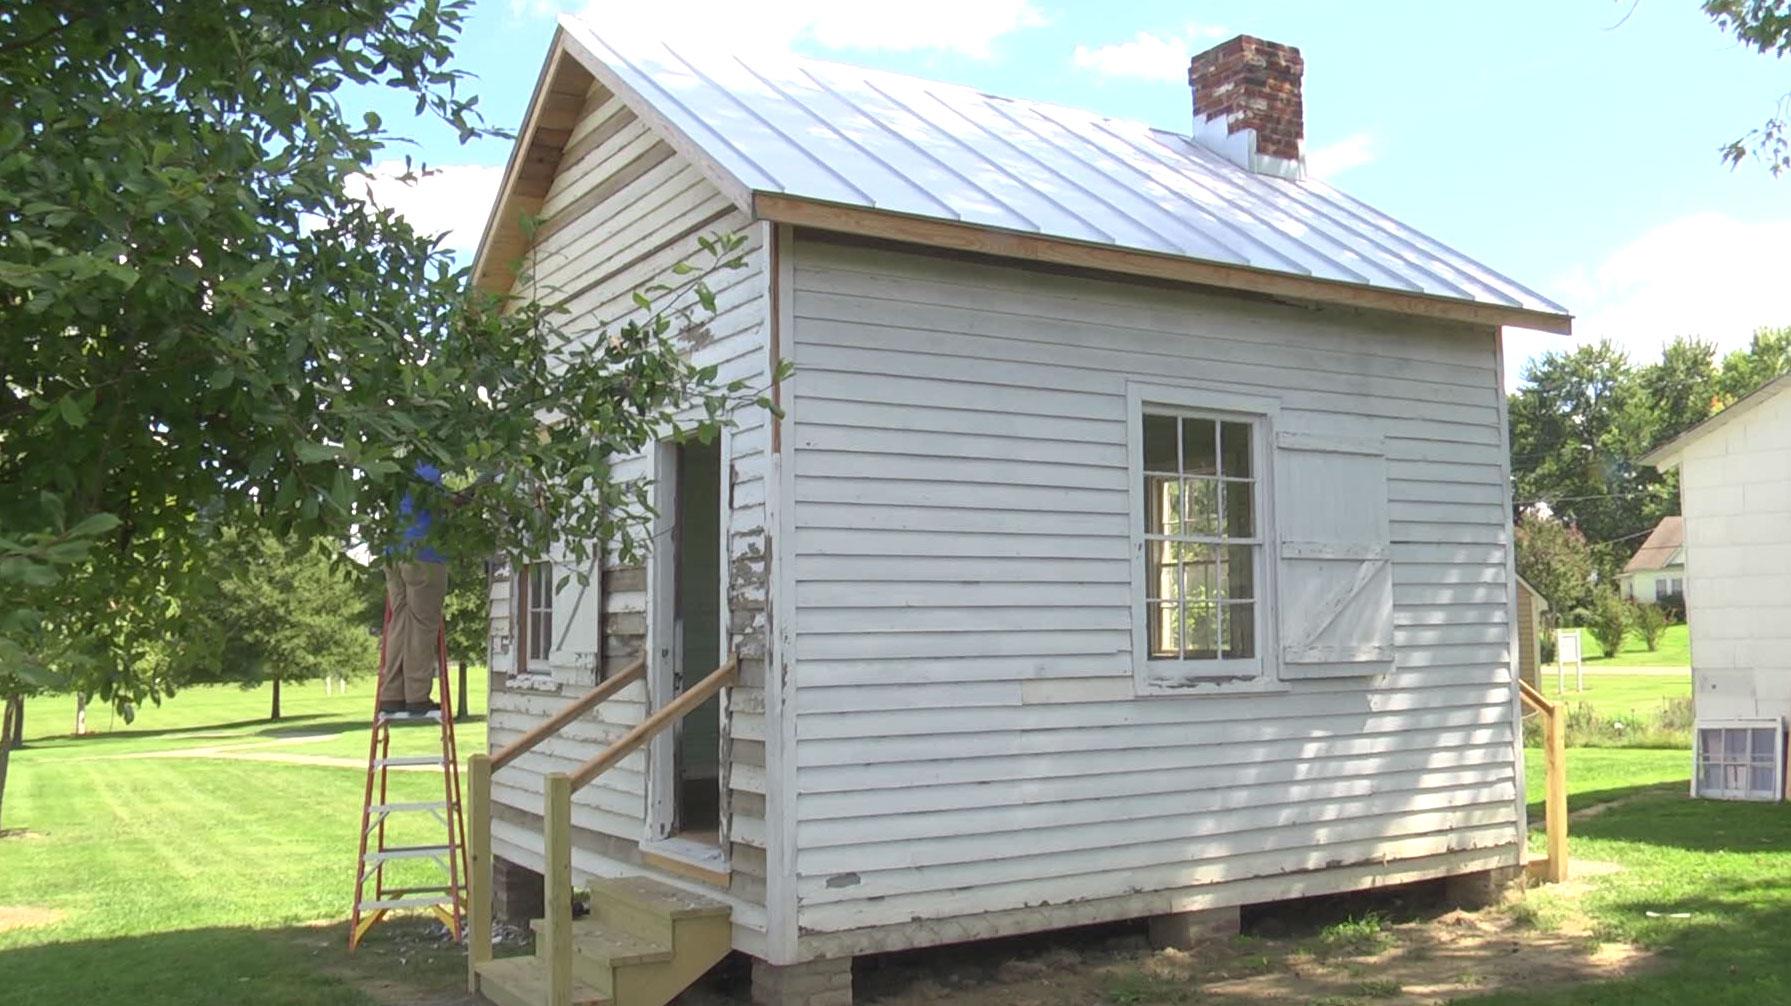 Trevilians schoolhouse